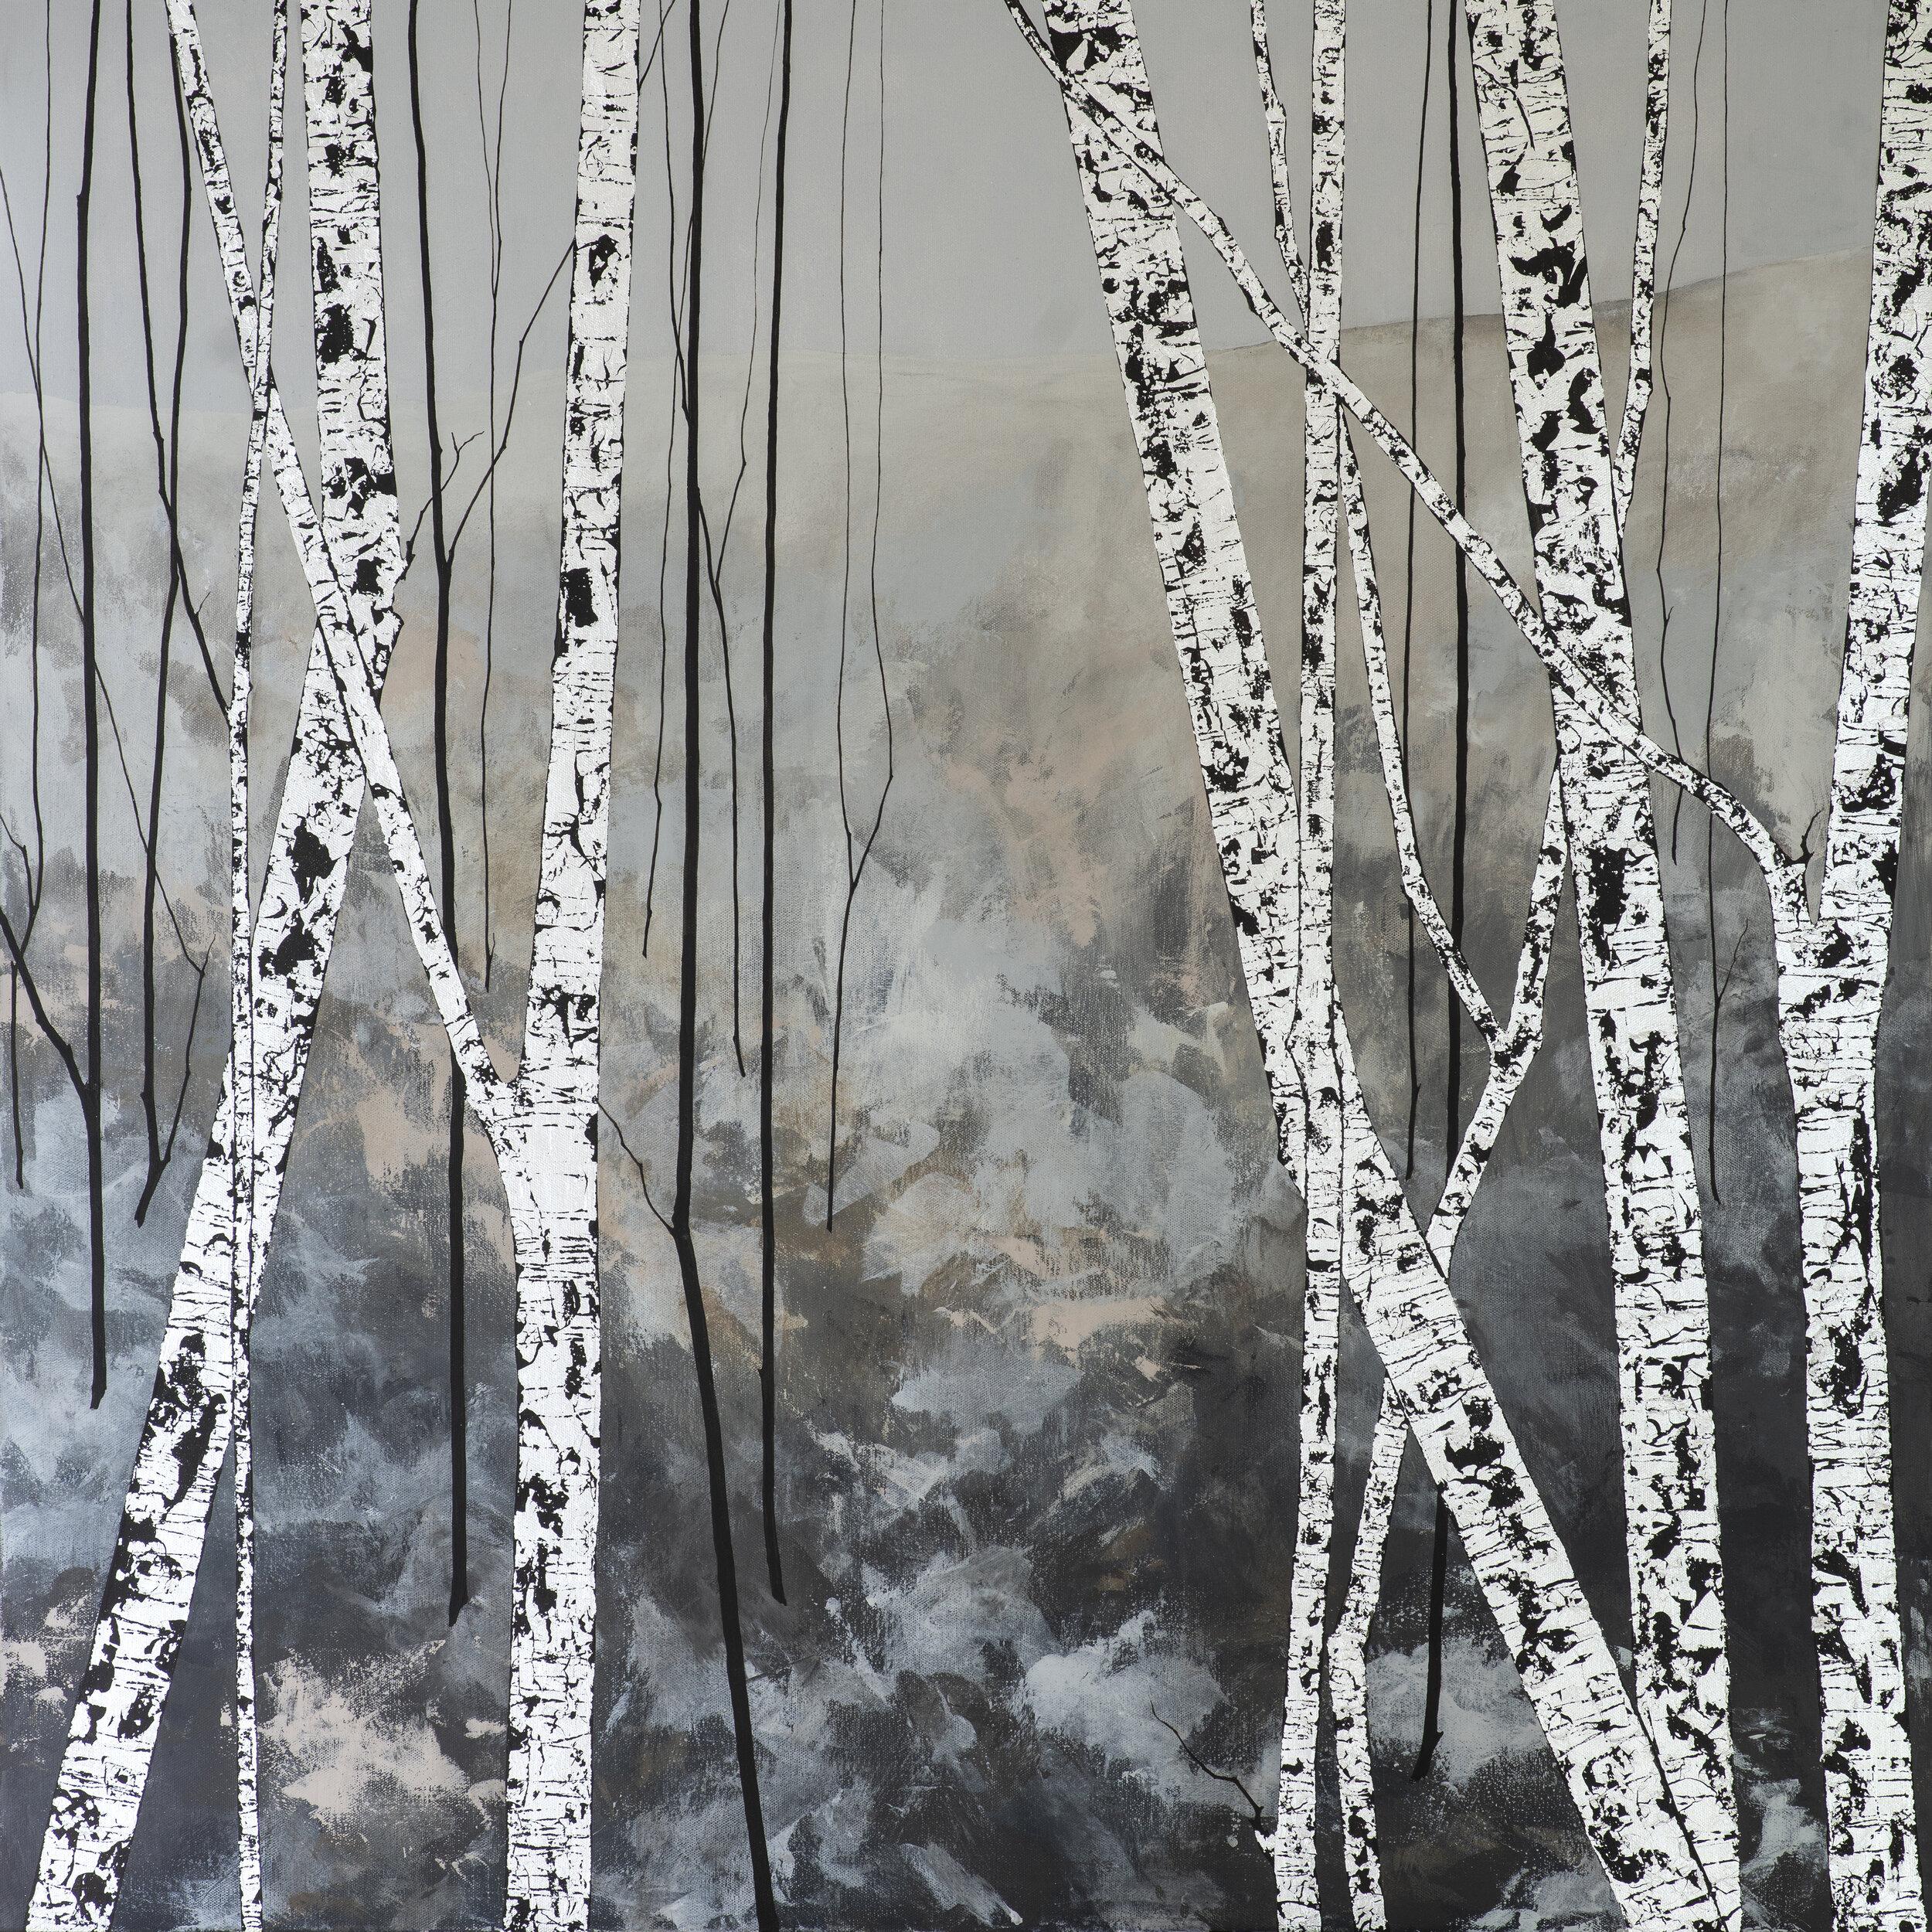 AGATHA'S FIELDS I 100x100cm | mixed media on canvas with silver leaf | £2,400.00